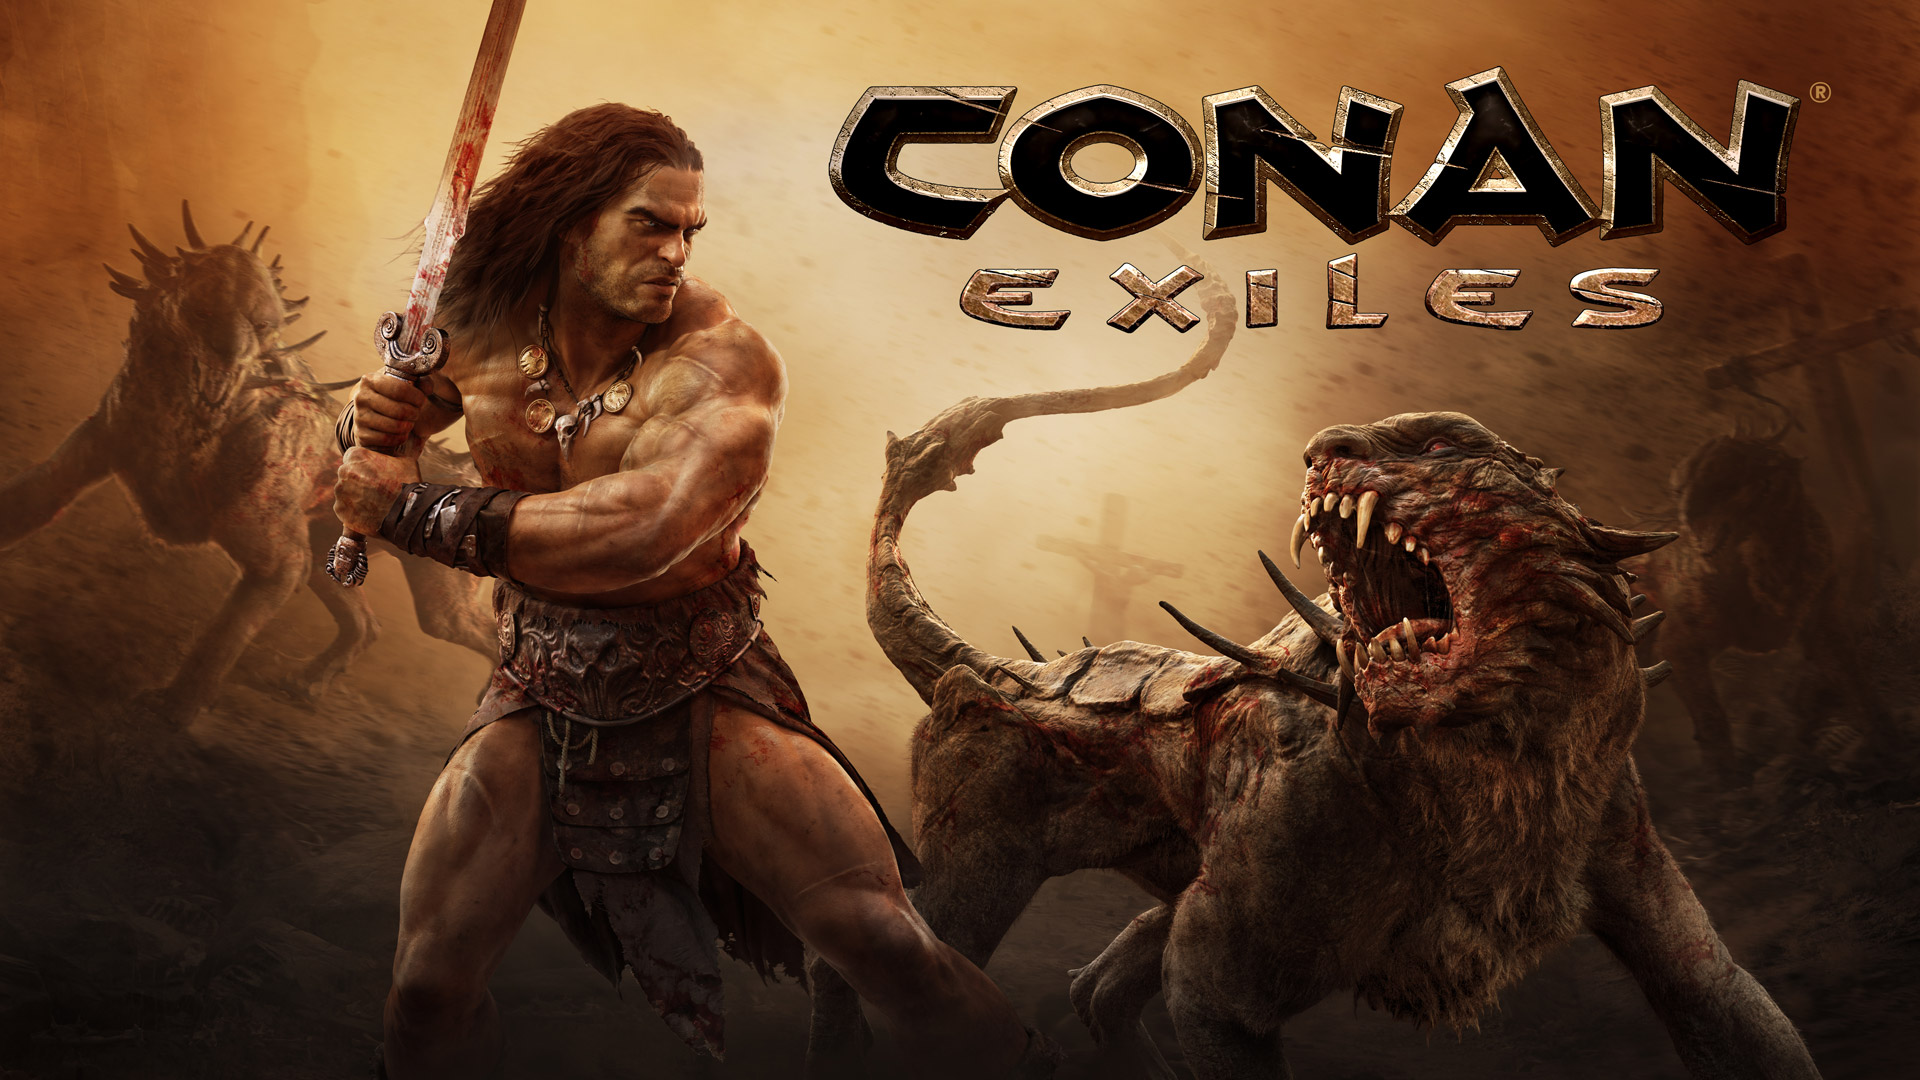 Free Conan Exiles Wallpaper in 1920x1080